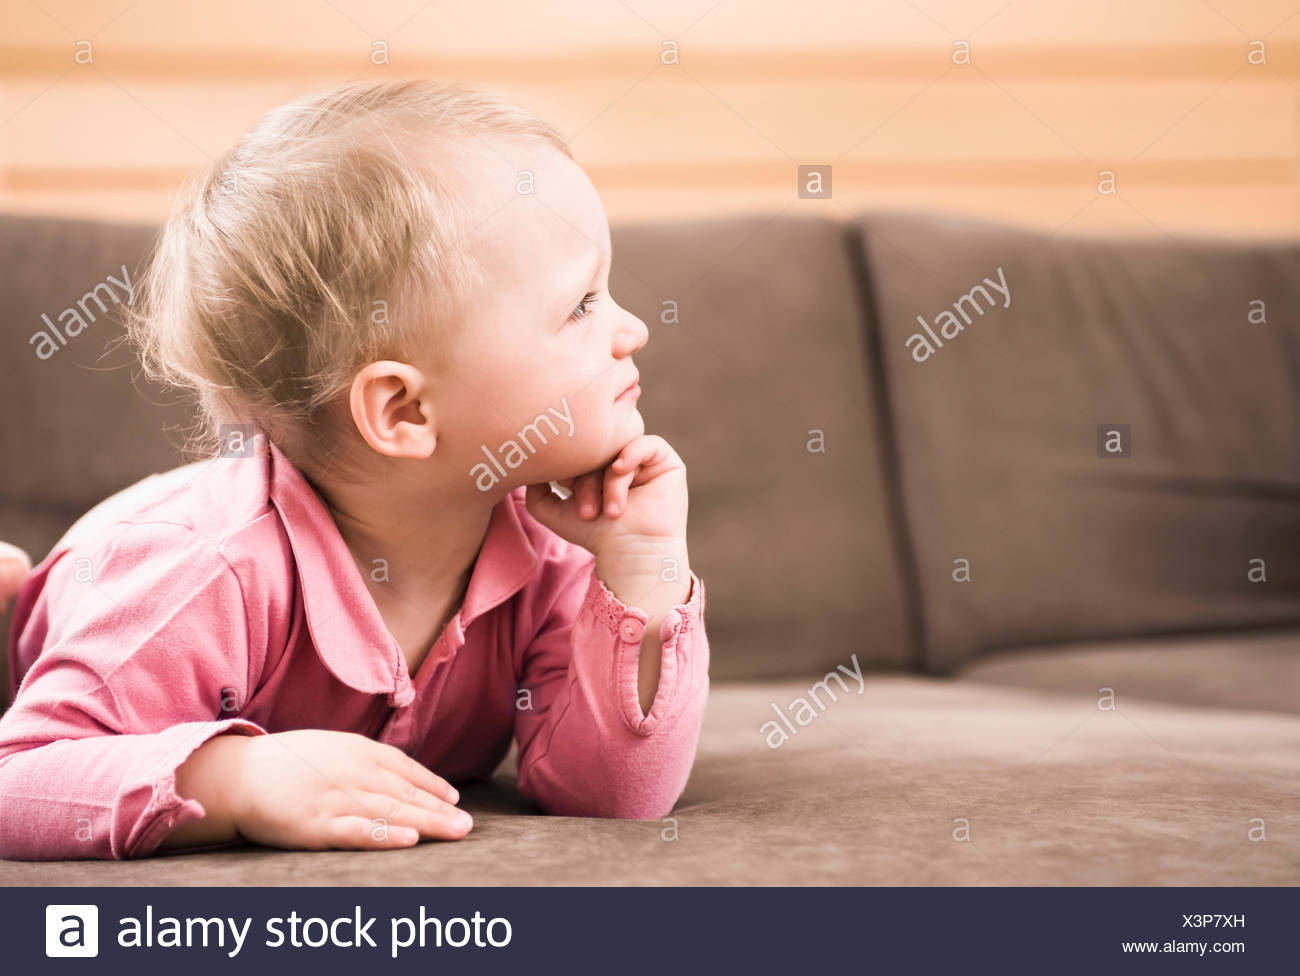 Baby Girl sofá pensando el perfil lateral Imagen De Stock